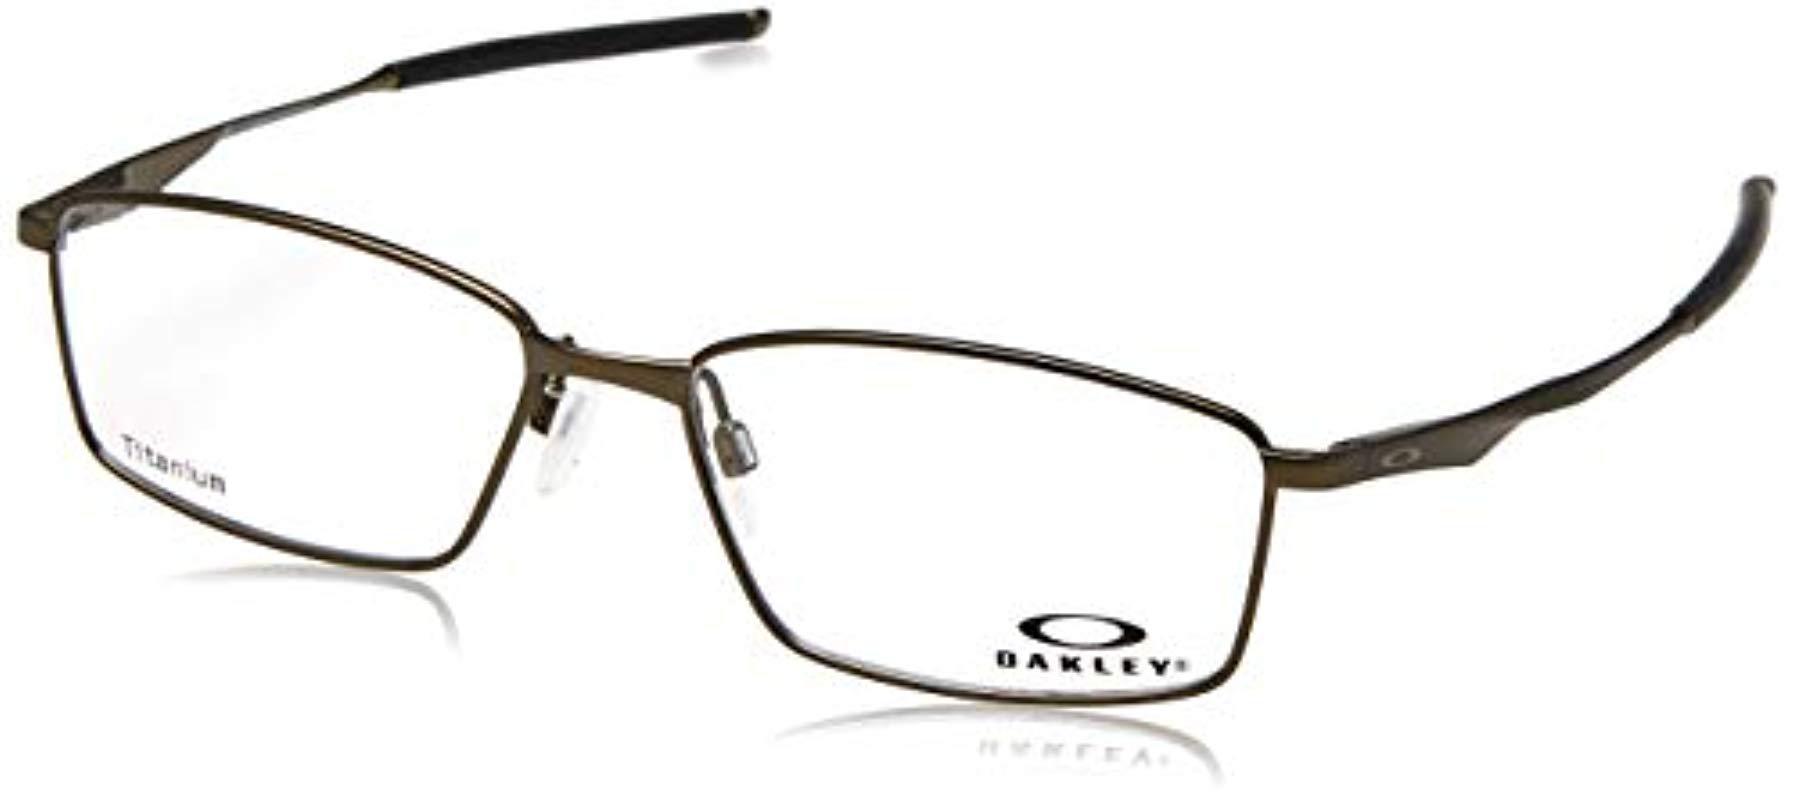 e1495545a4 Ray-Ban Limit Switch Optical Frames